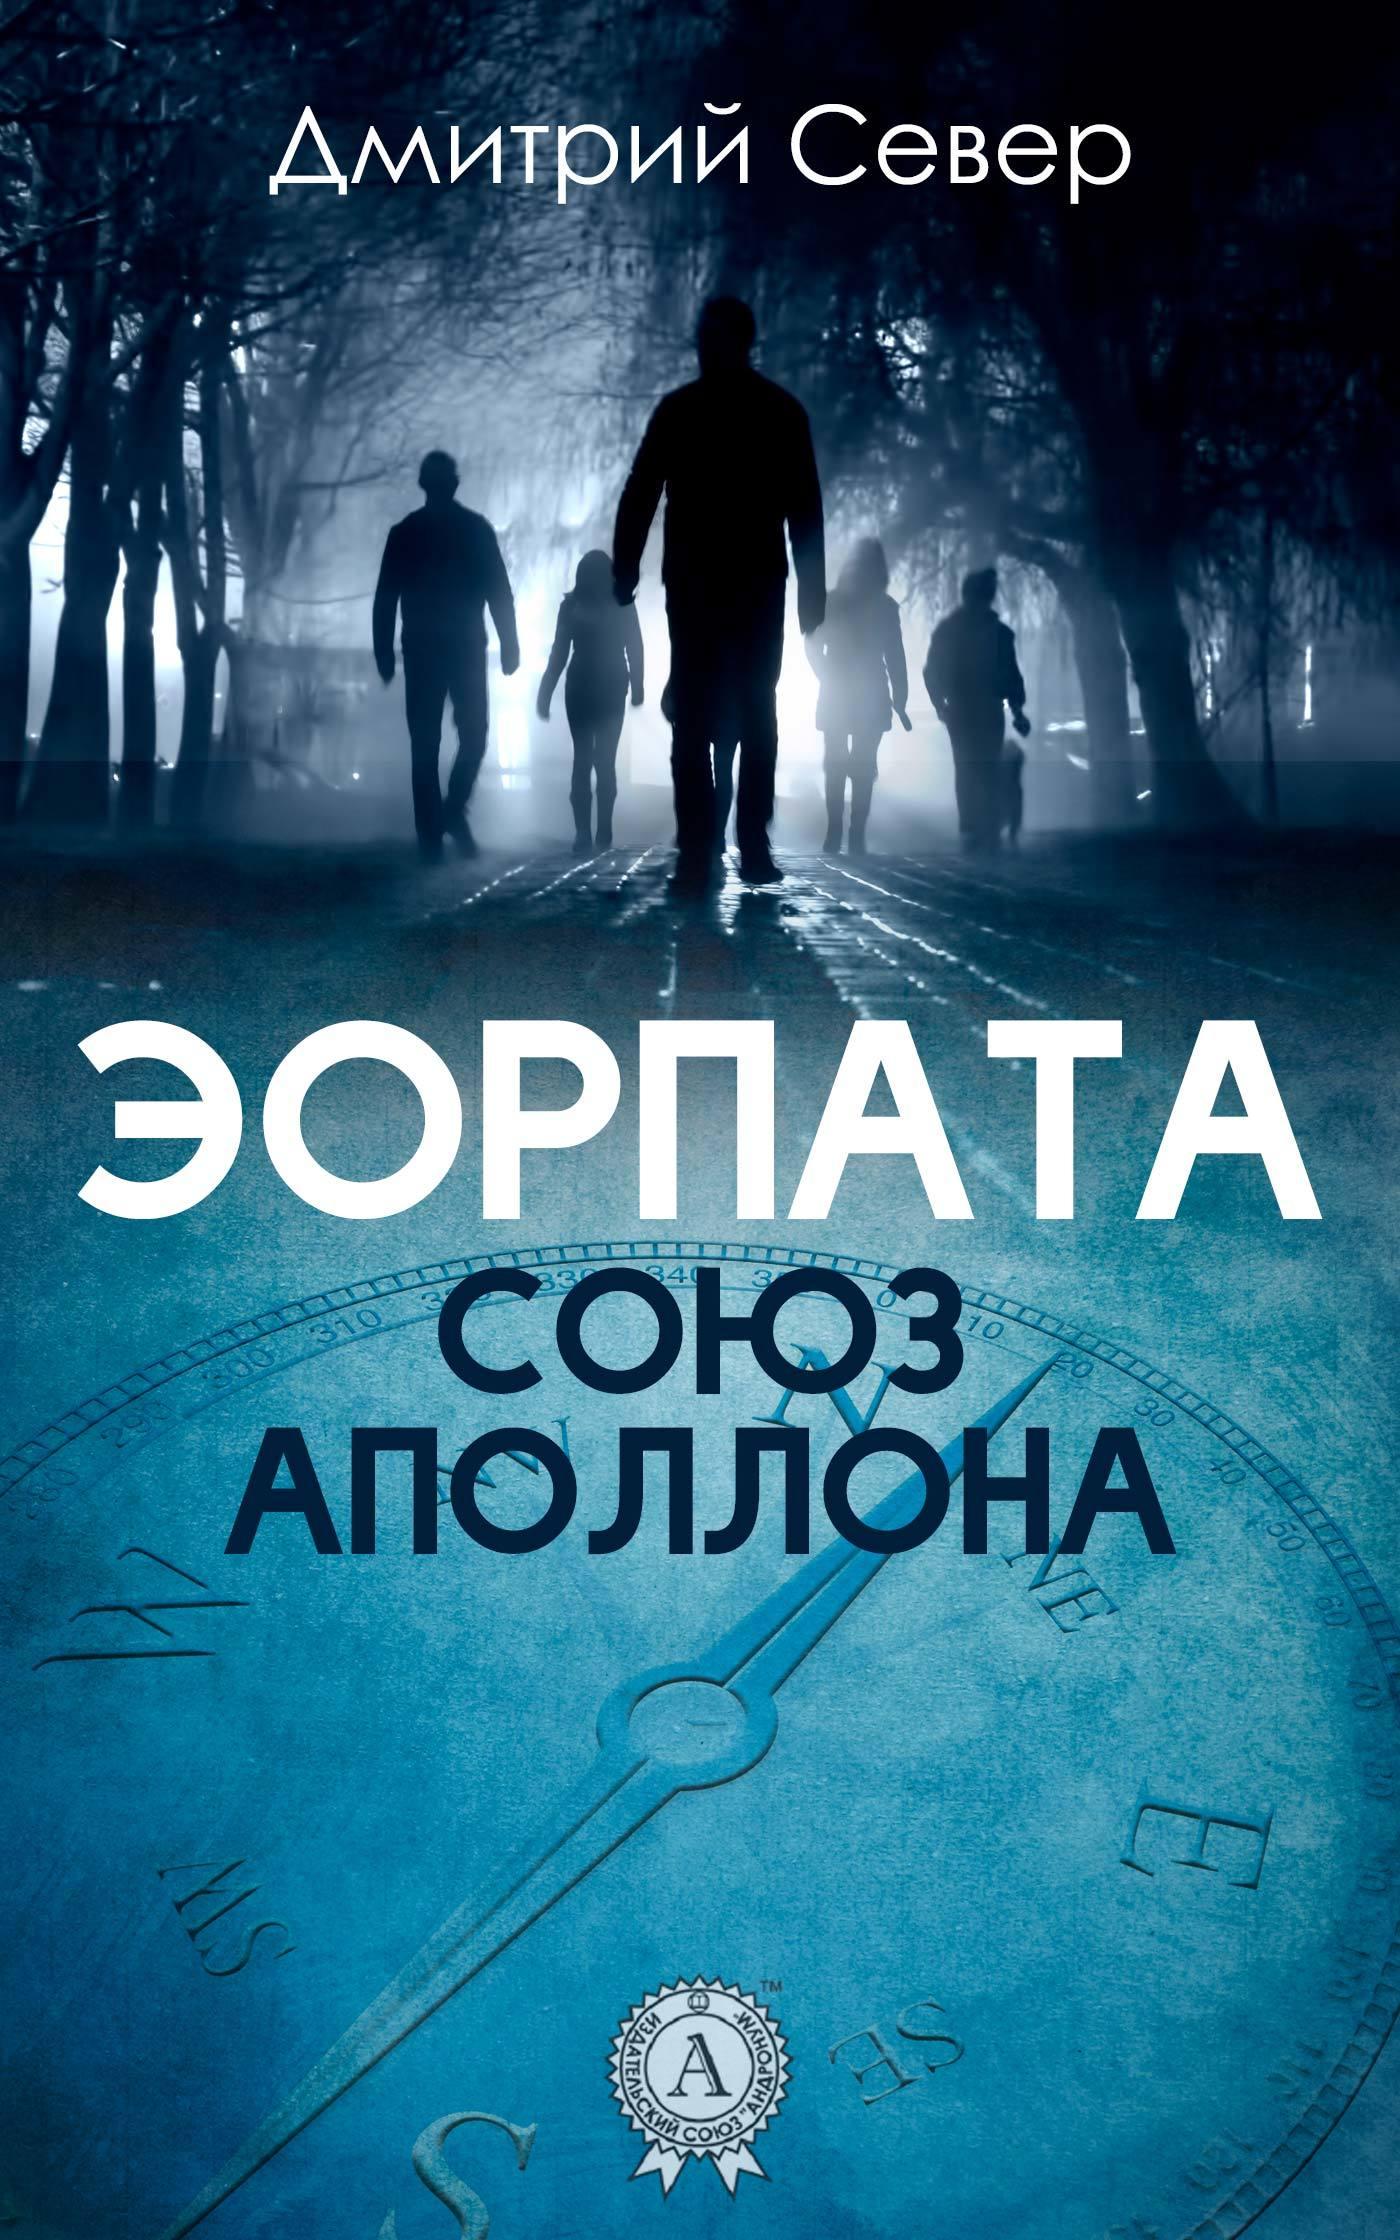 Обложка книги Союз Аполлона, автор Дмитрий Север